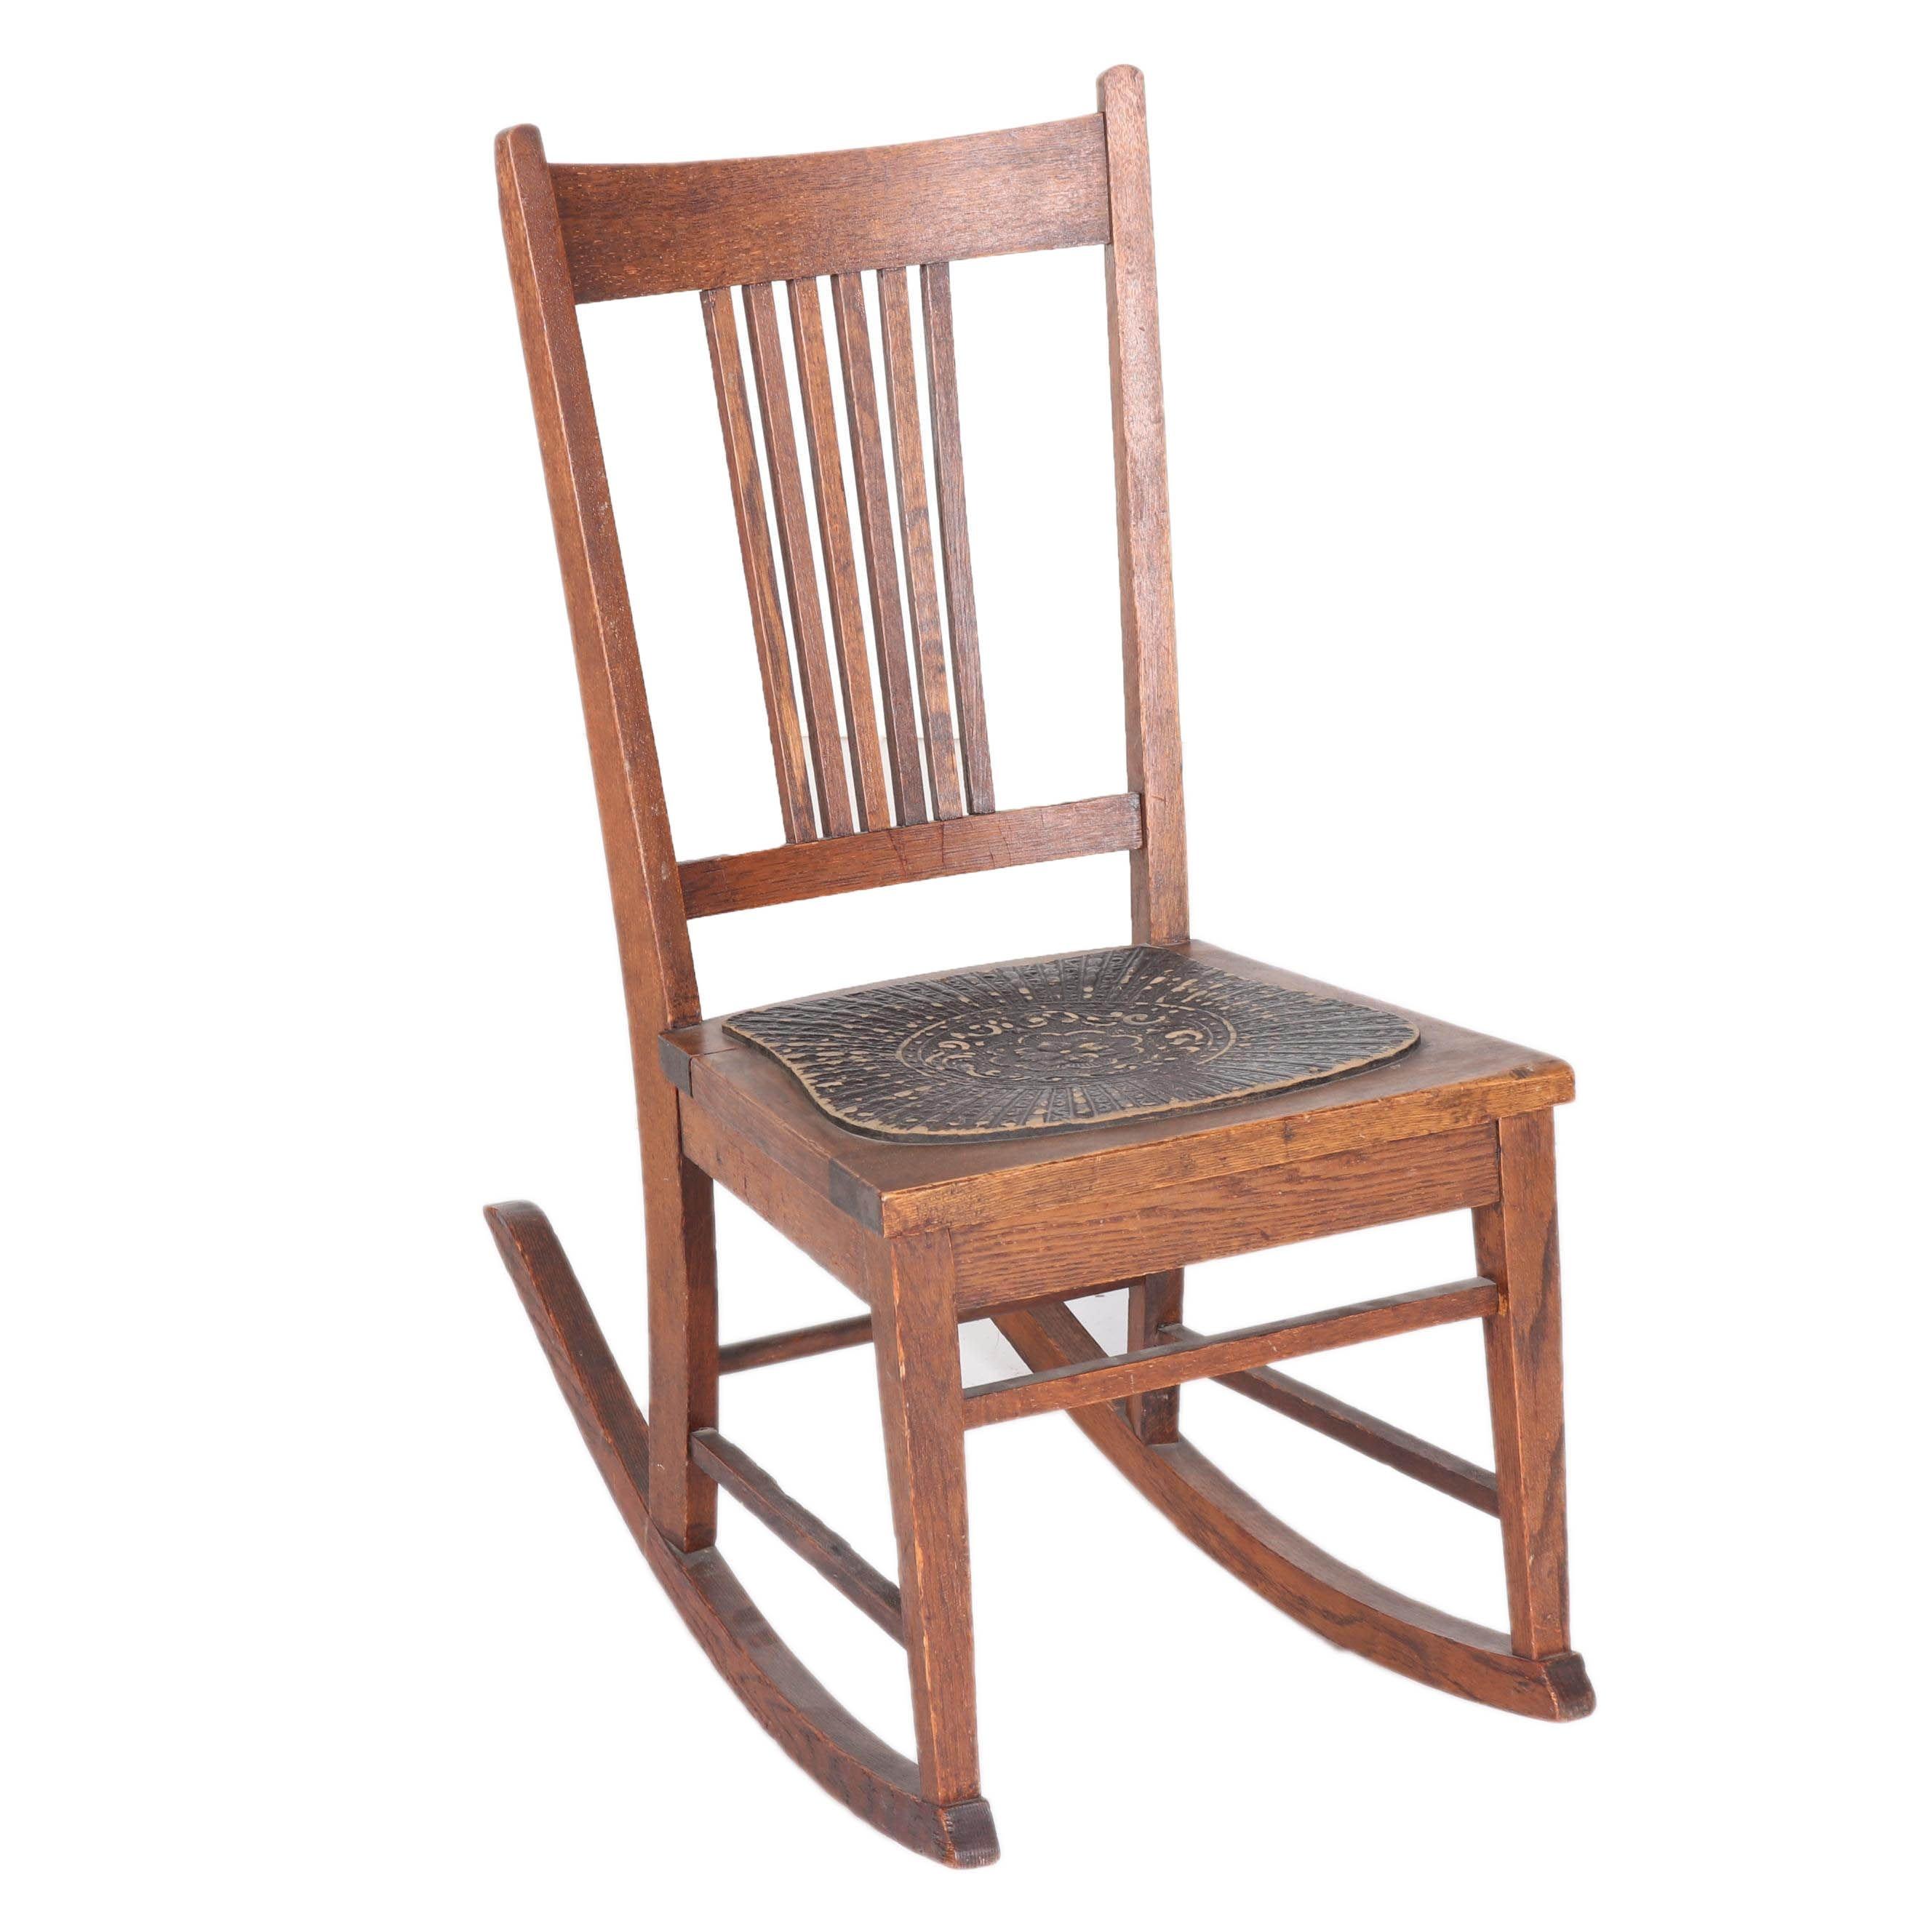 Vintage Oak Children's Rocking Chair by W.F. Whitney